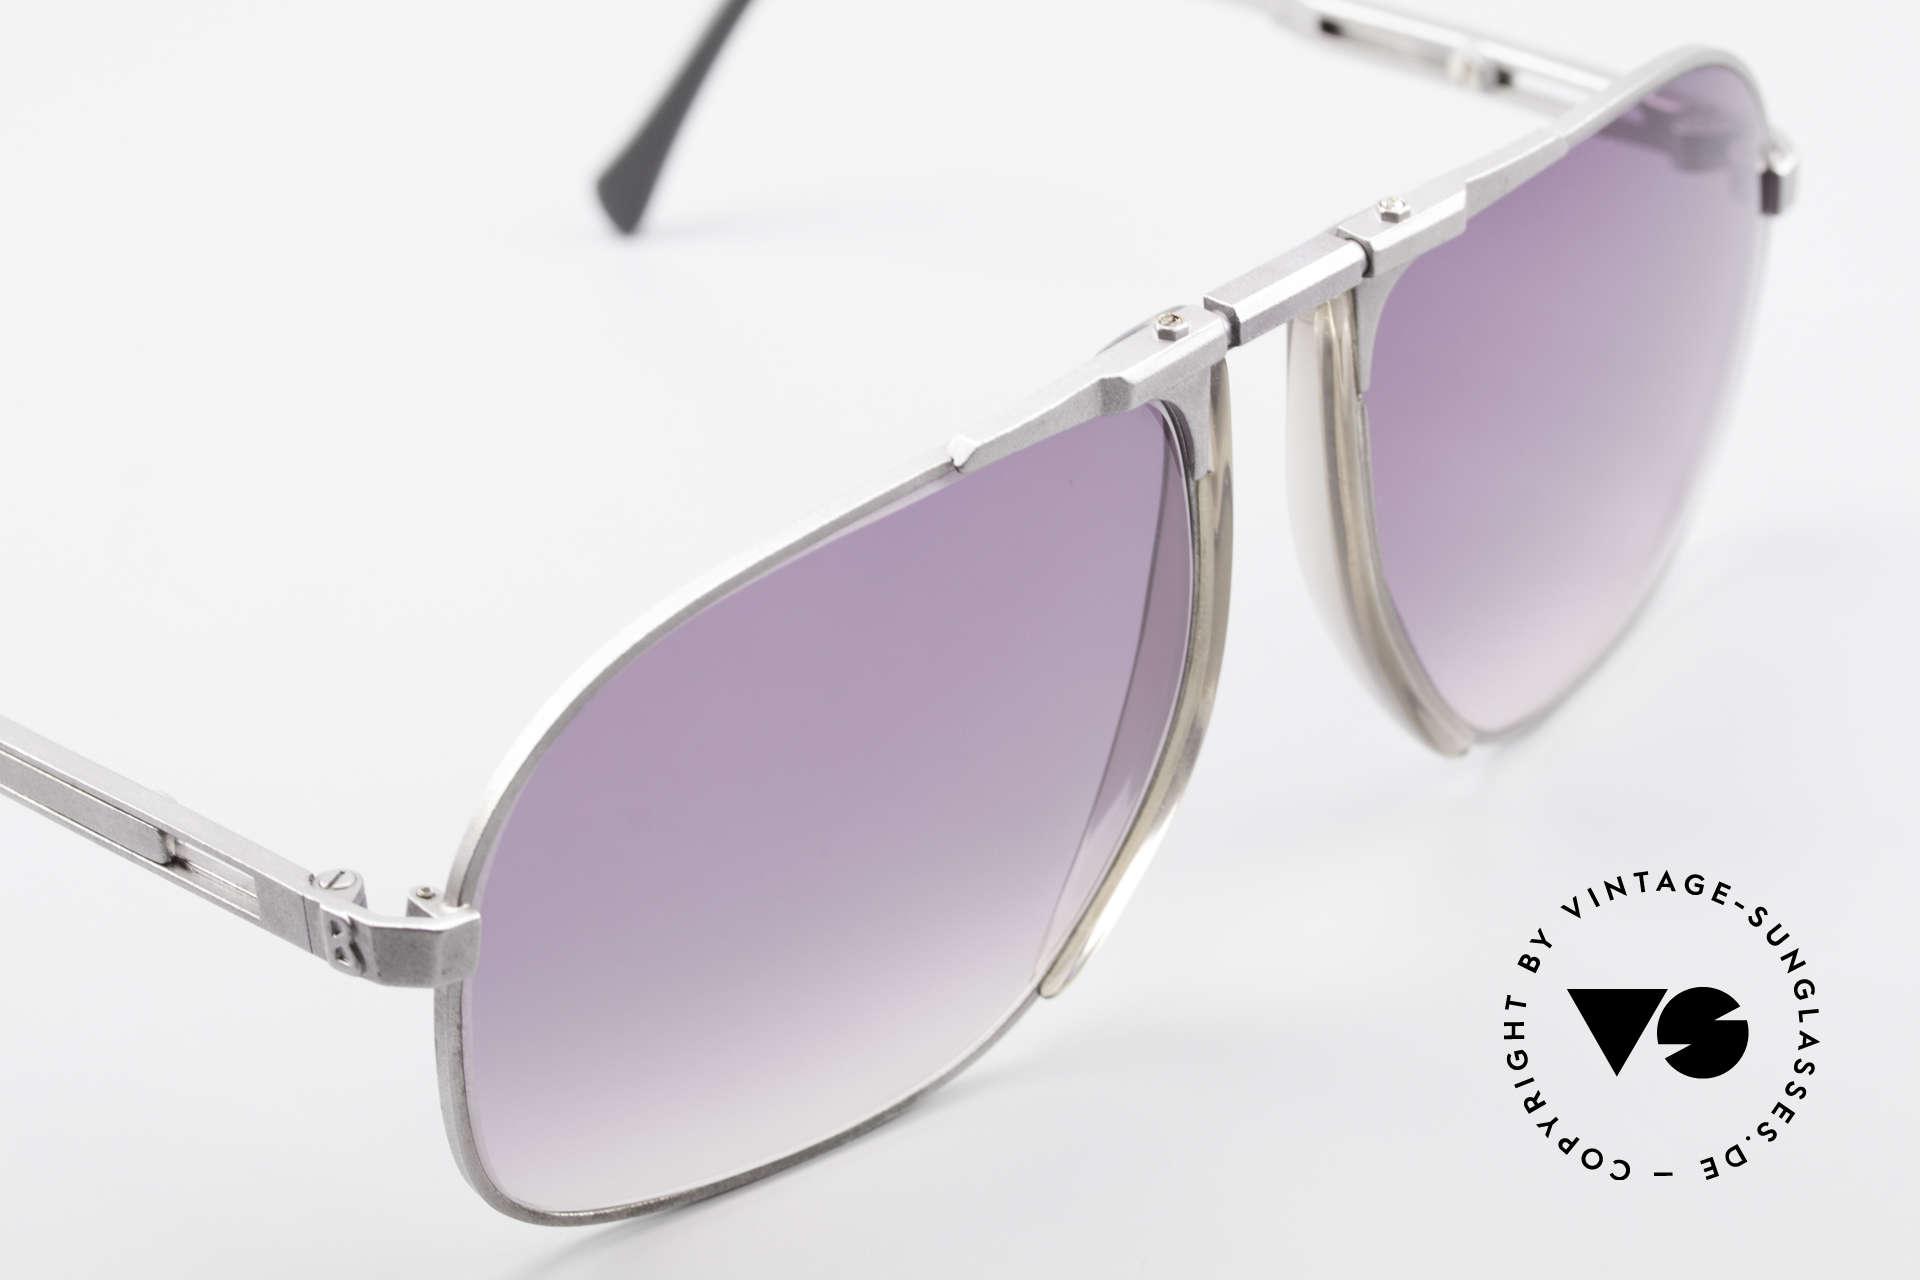 Willy Bogner 7023 Adjustable Sunglasses 80's, unworn (like all our vintage sunglasses by W. BOGNER), Made for Men